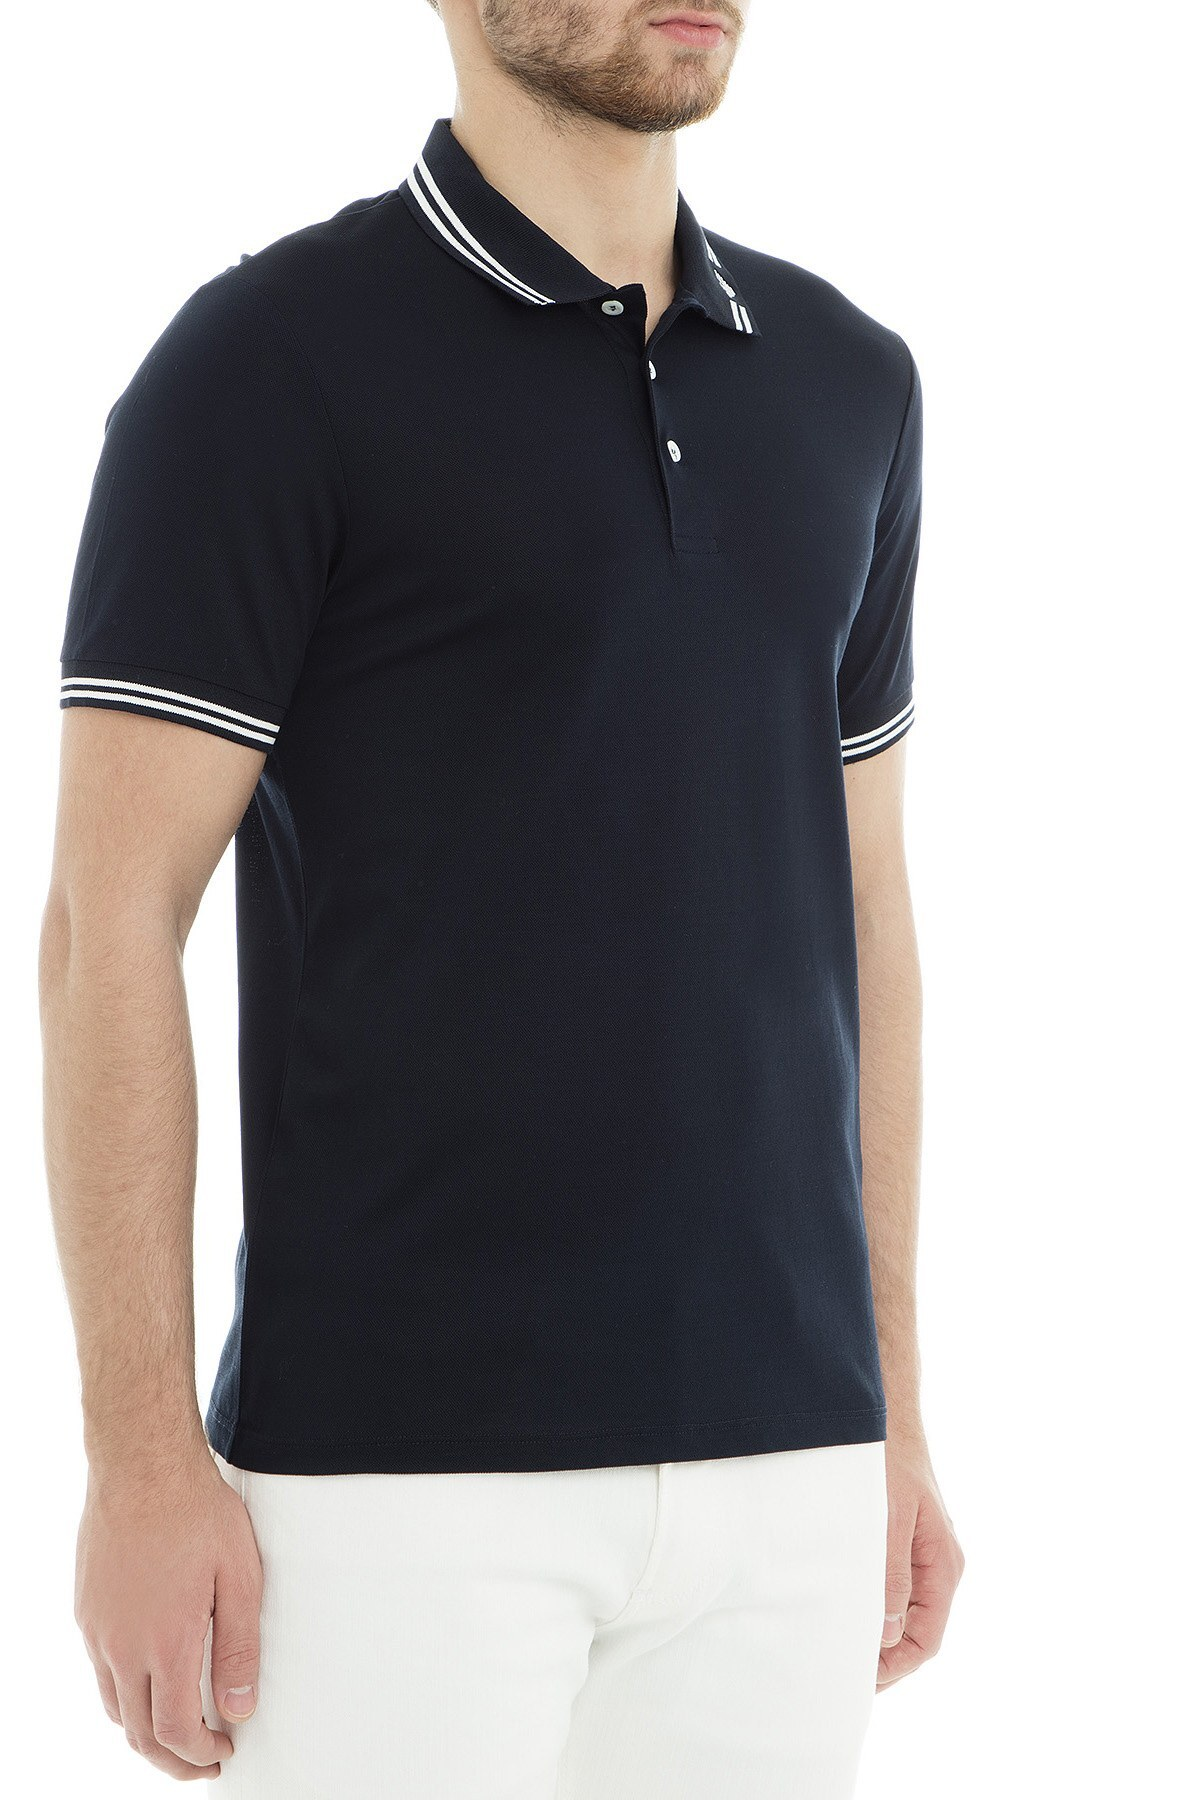 Emporio Armani Polo Erkek T Shirt 3G1FL0 1JBQZ 0920 LACİVERT